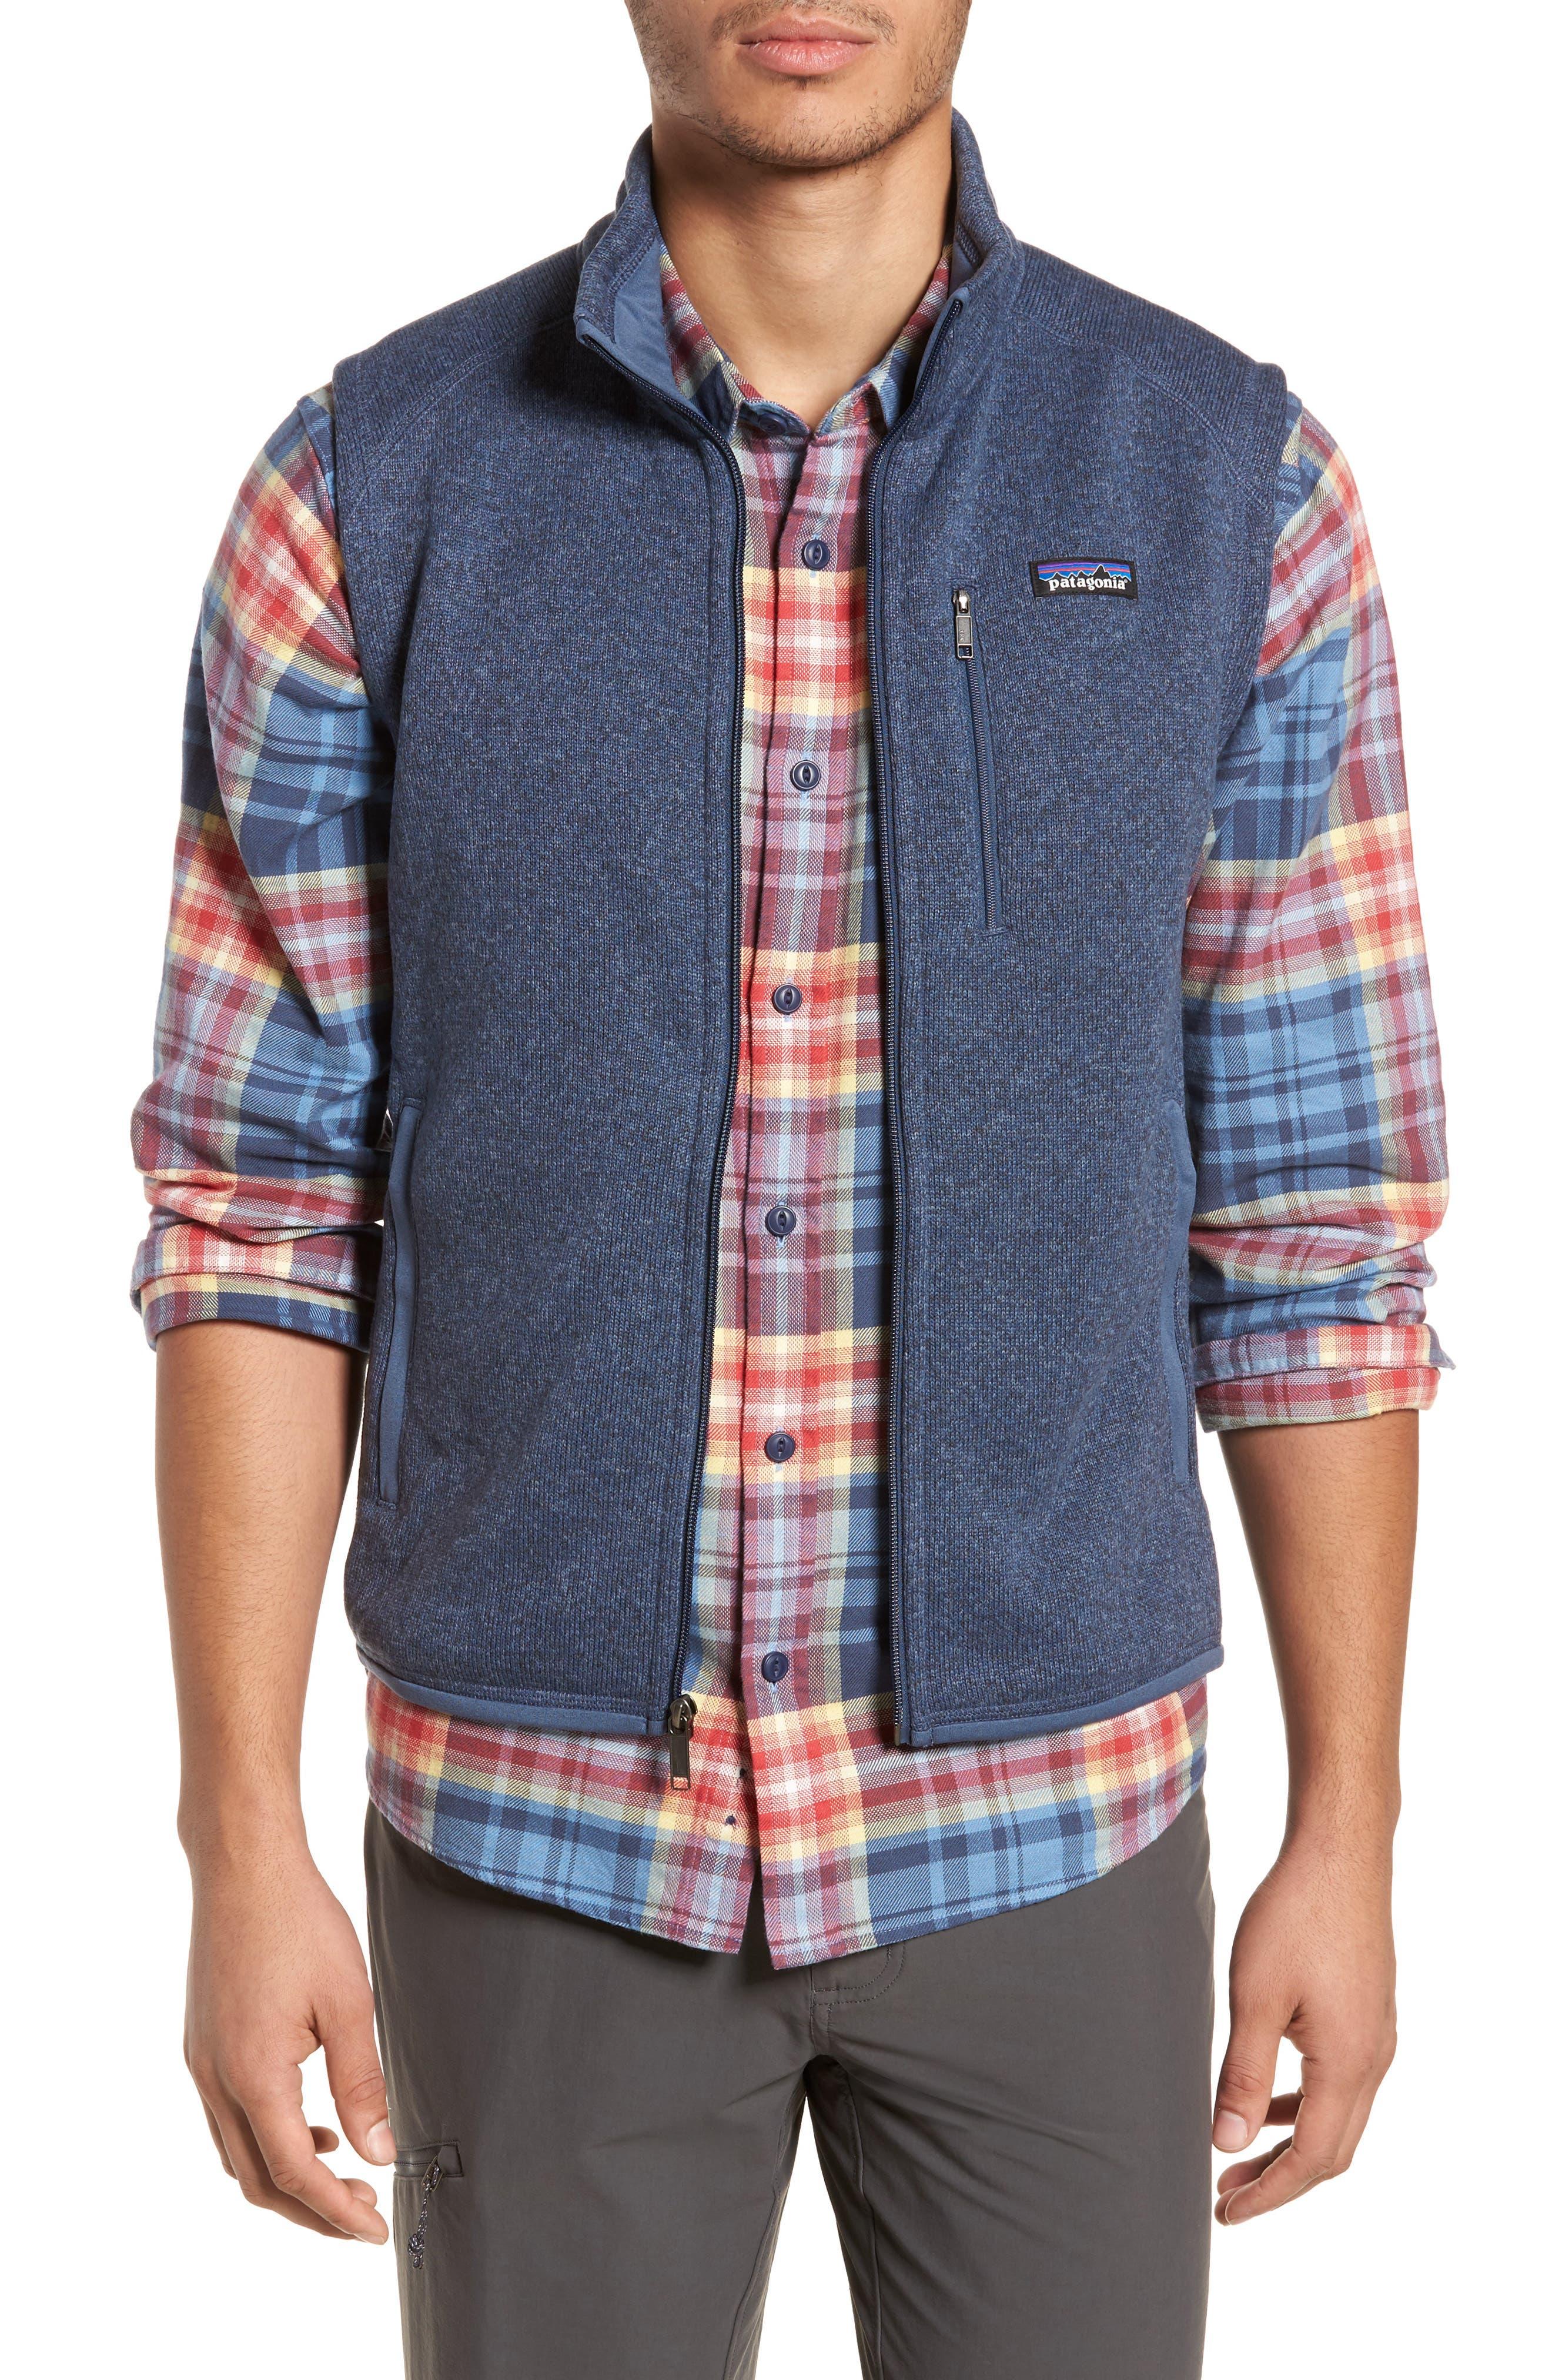 PATAGONIA, 'Better Sweater' Zip Front Vest, Main thumbnail 1, color, DOLOMITE BLUE